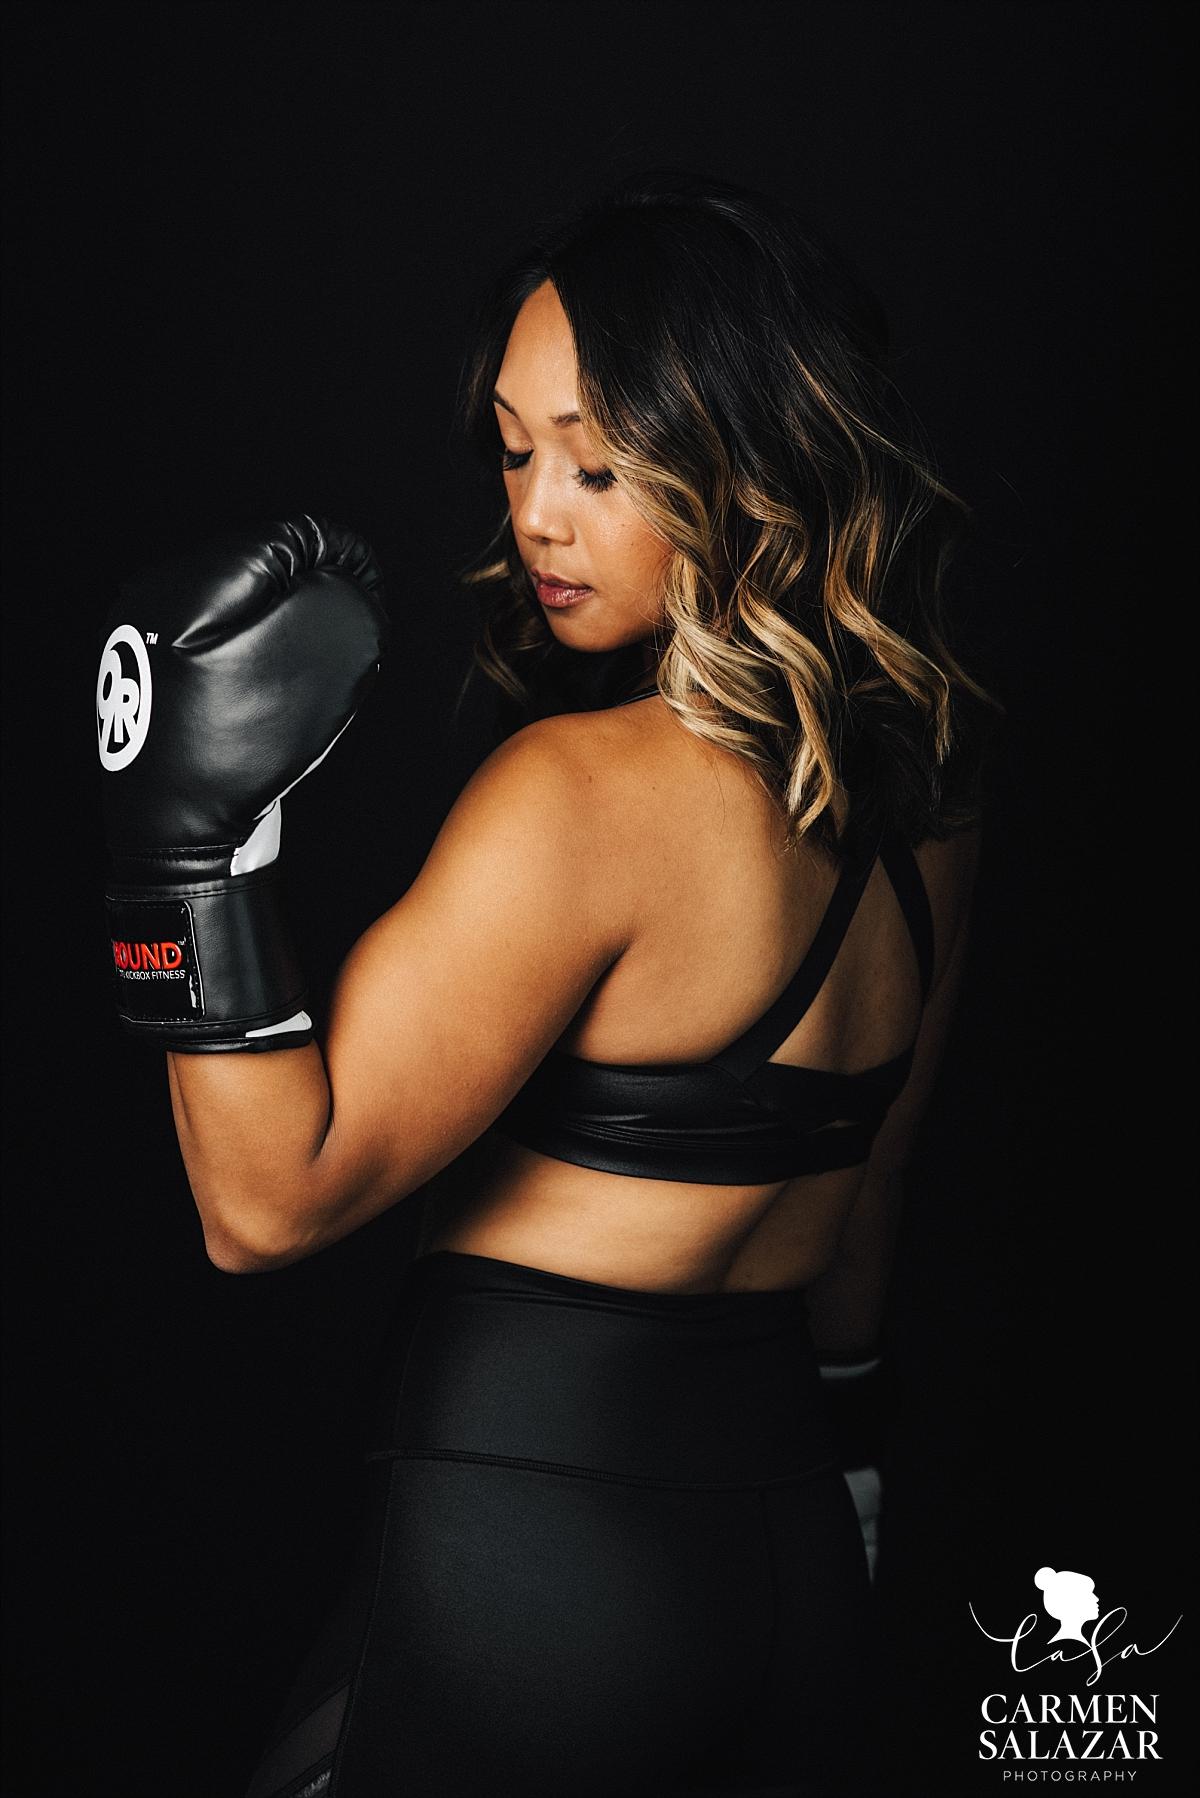 Fitness goal empower portraits - Carmen Salazar